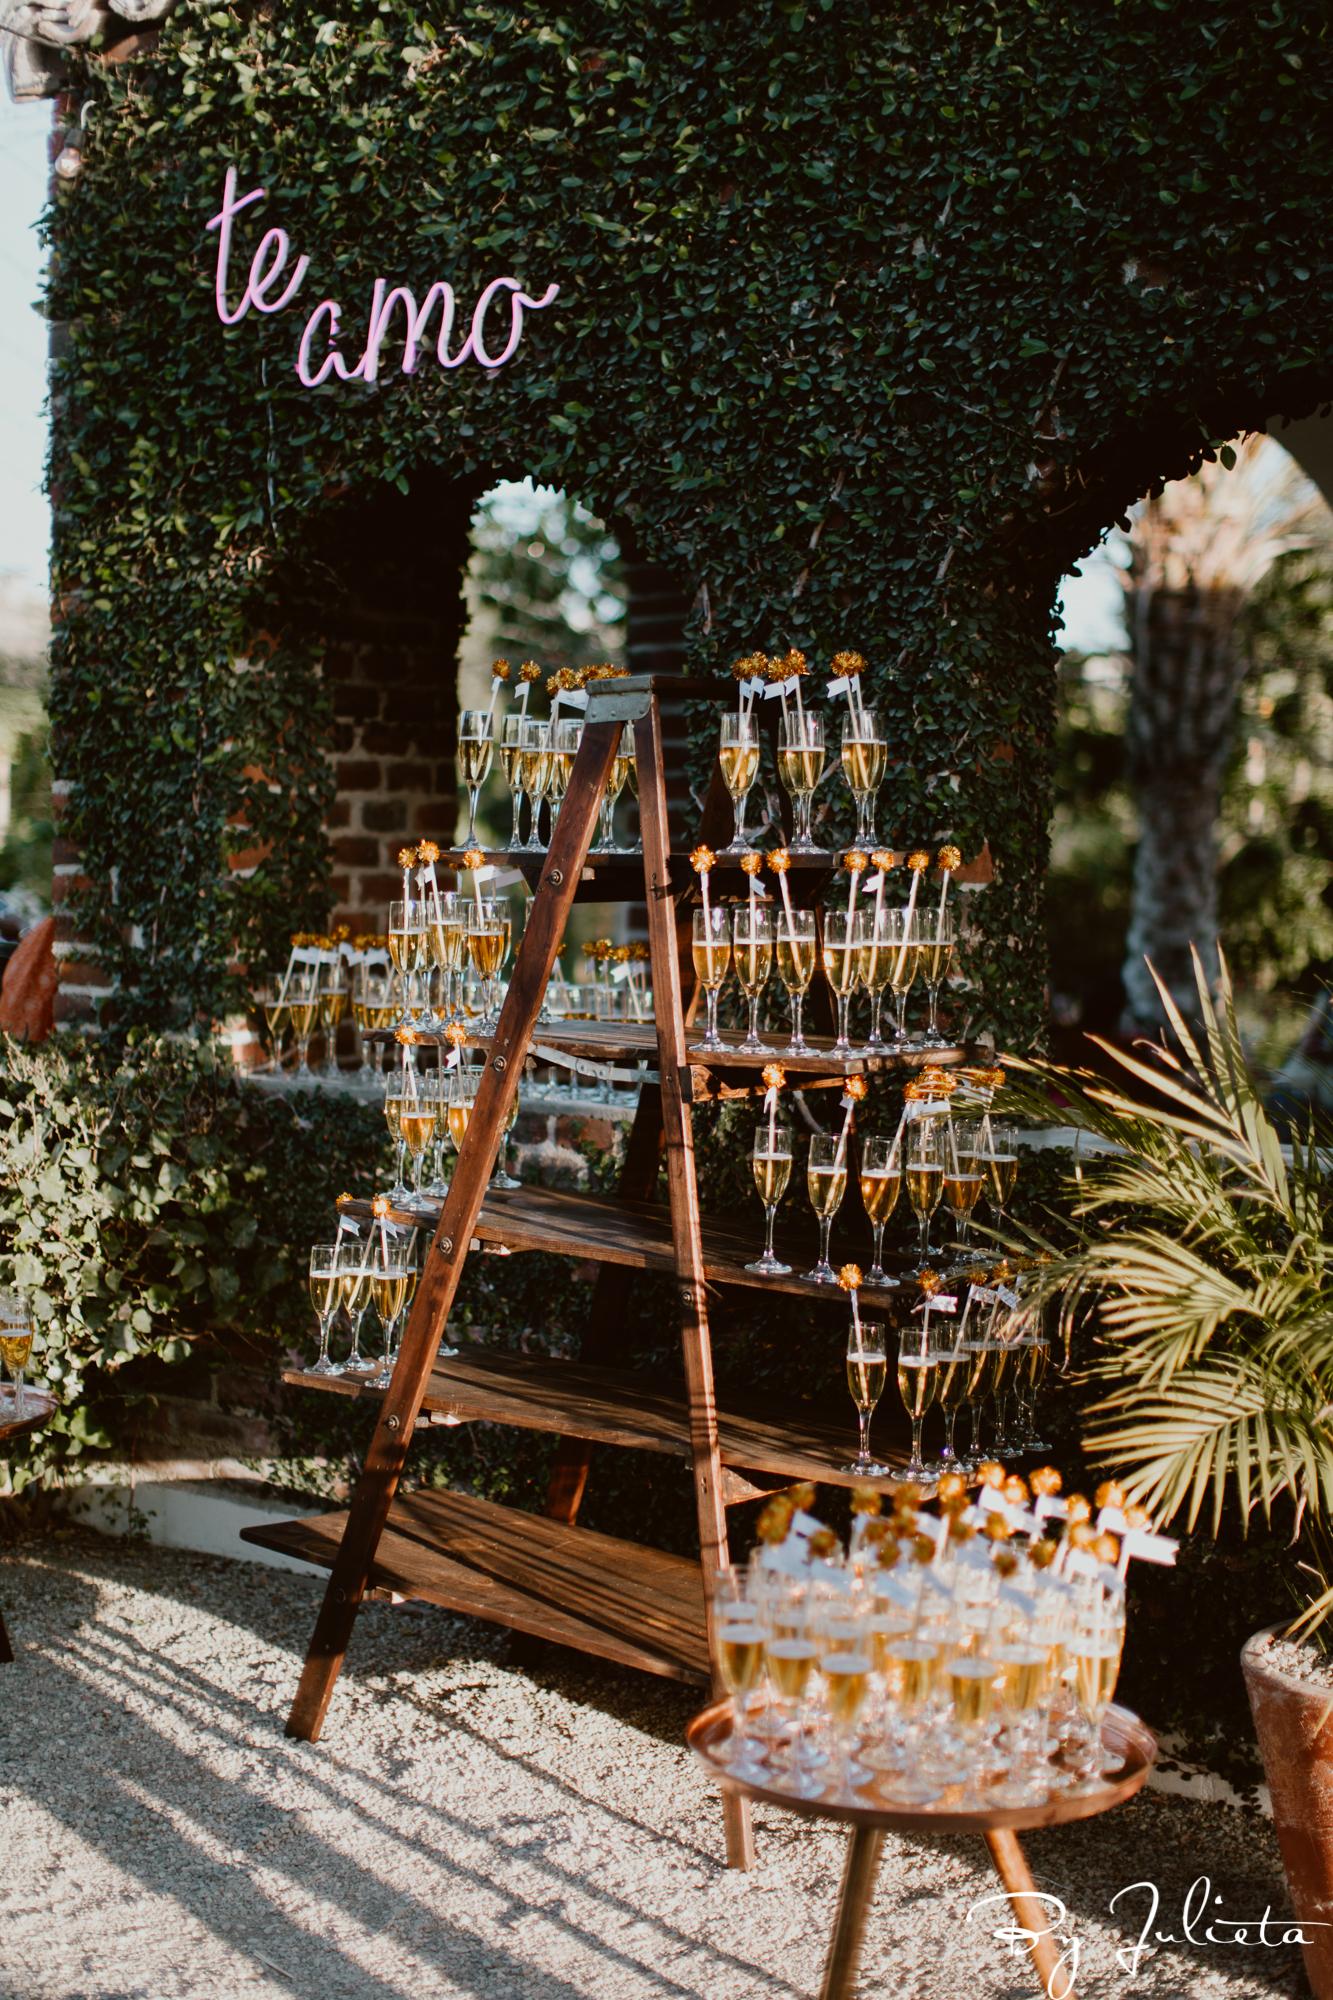 Flora Farms Wedding. A+D. Julieta Amezcua Photography-613.jpg